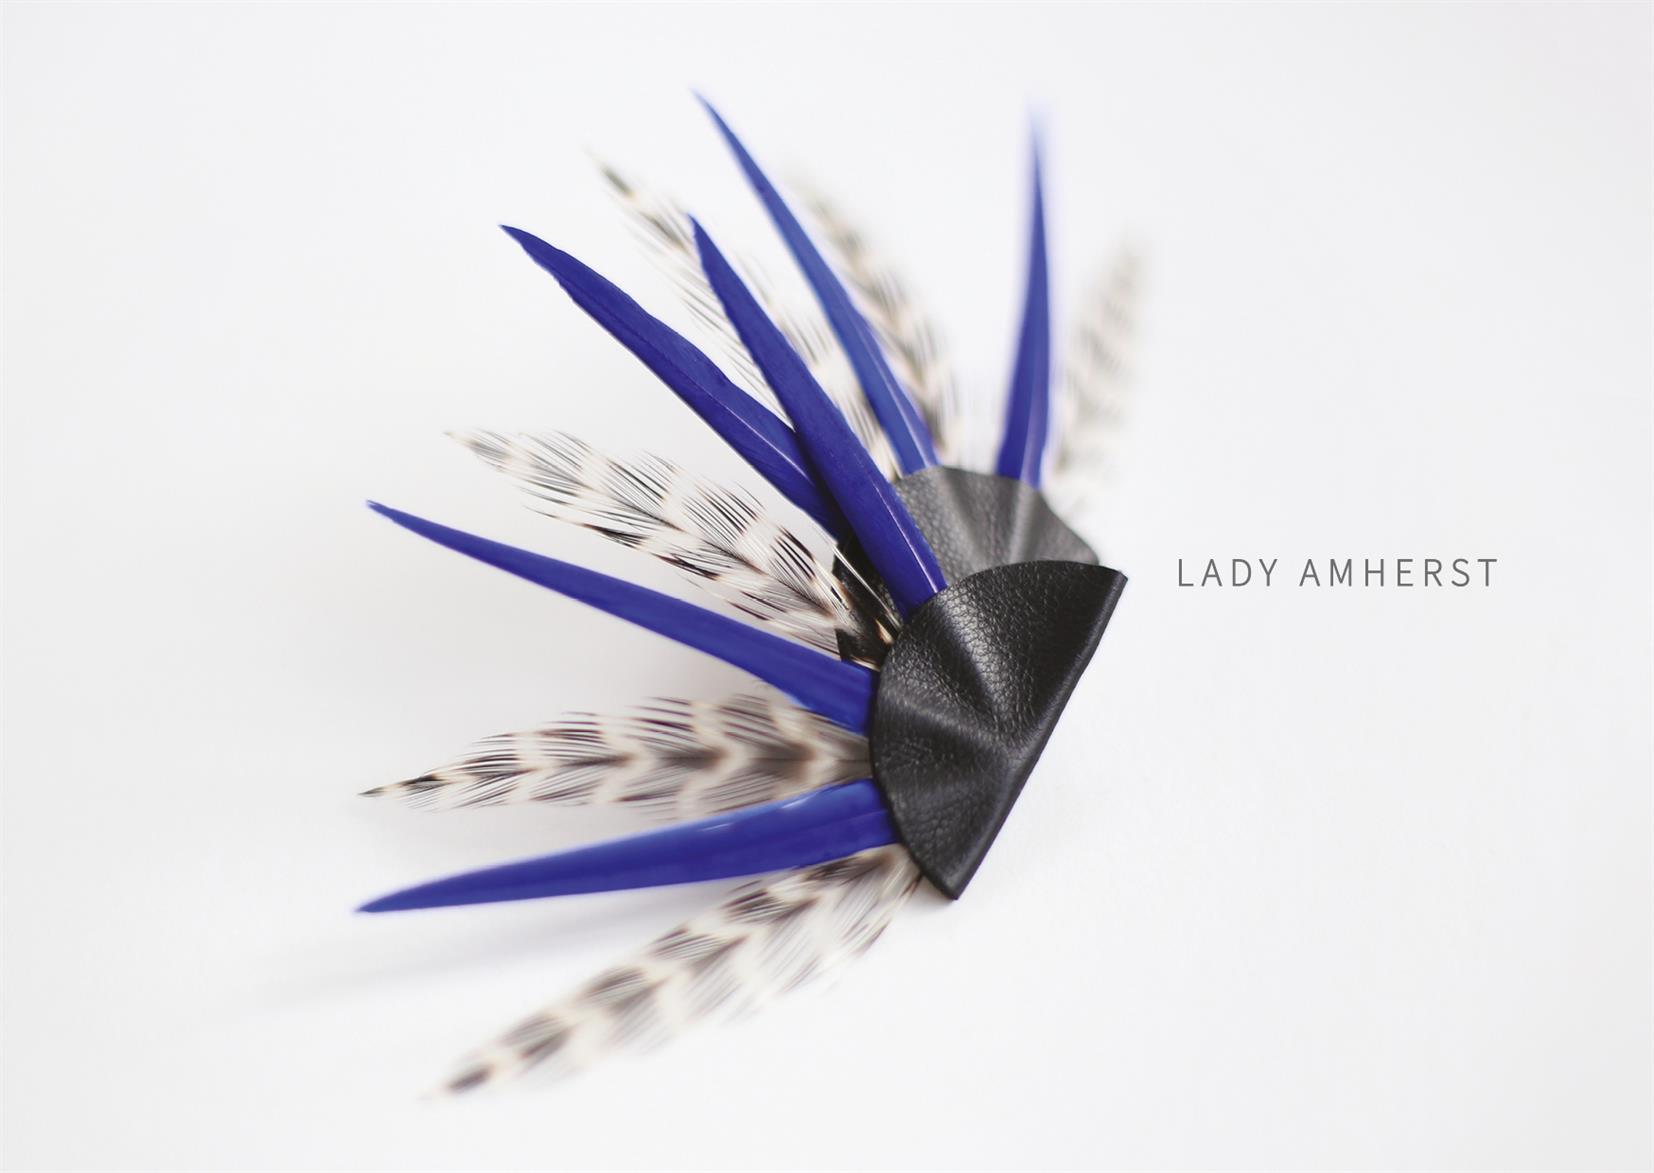 Céline Bouriaud Lemesle (Lady Amherst)